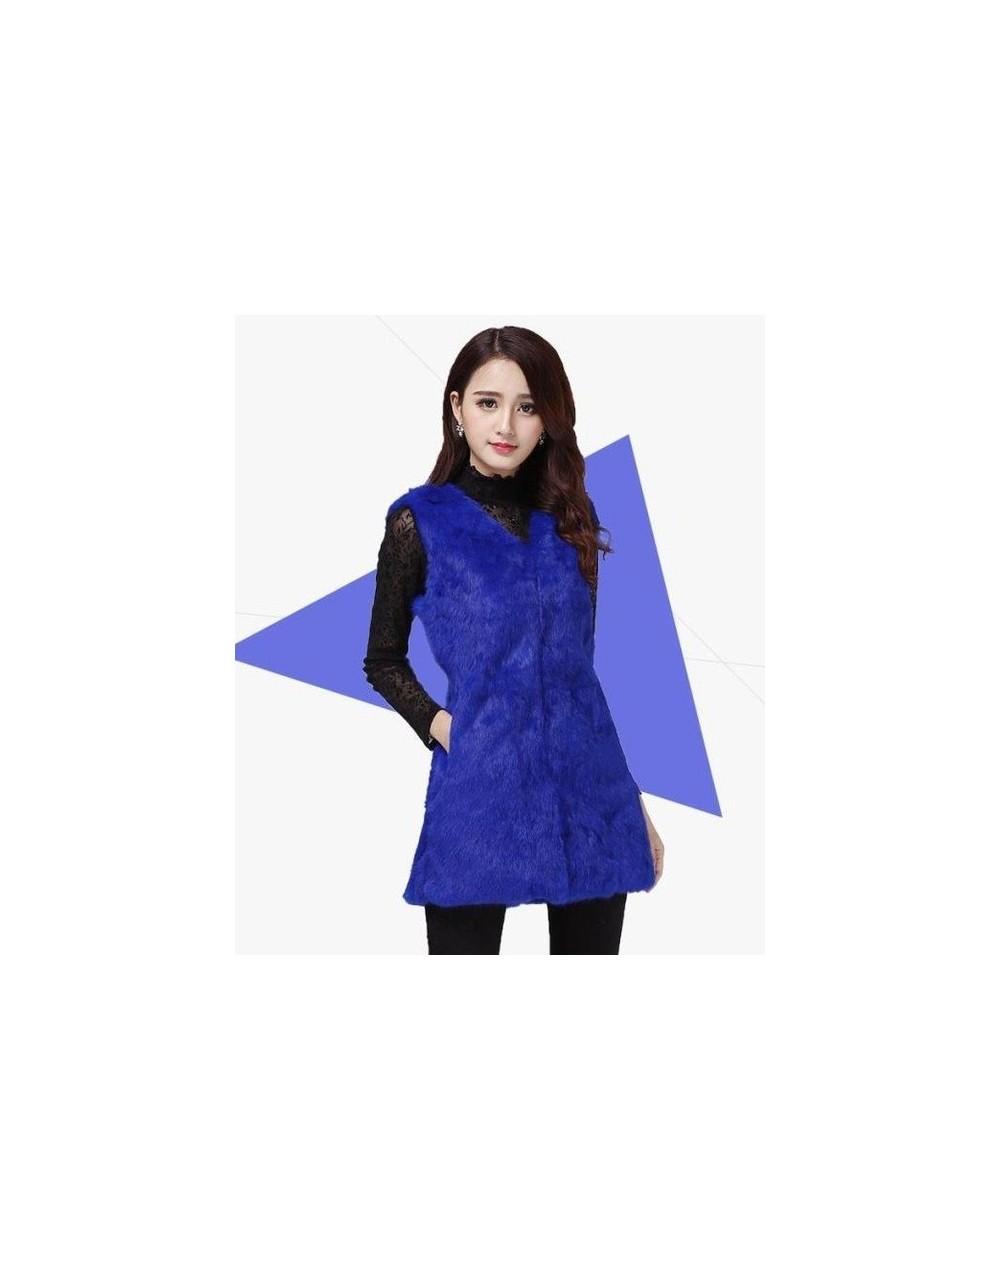 Real natural genuine rabbit fur coat women fashion rabbit fur vest gilet ladies jacket outwear overcoat custom any size - Bl...